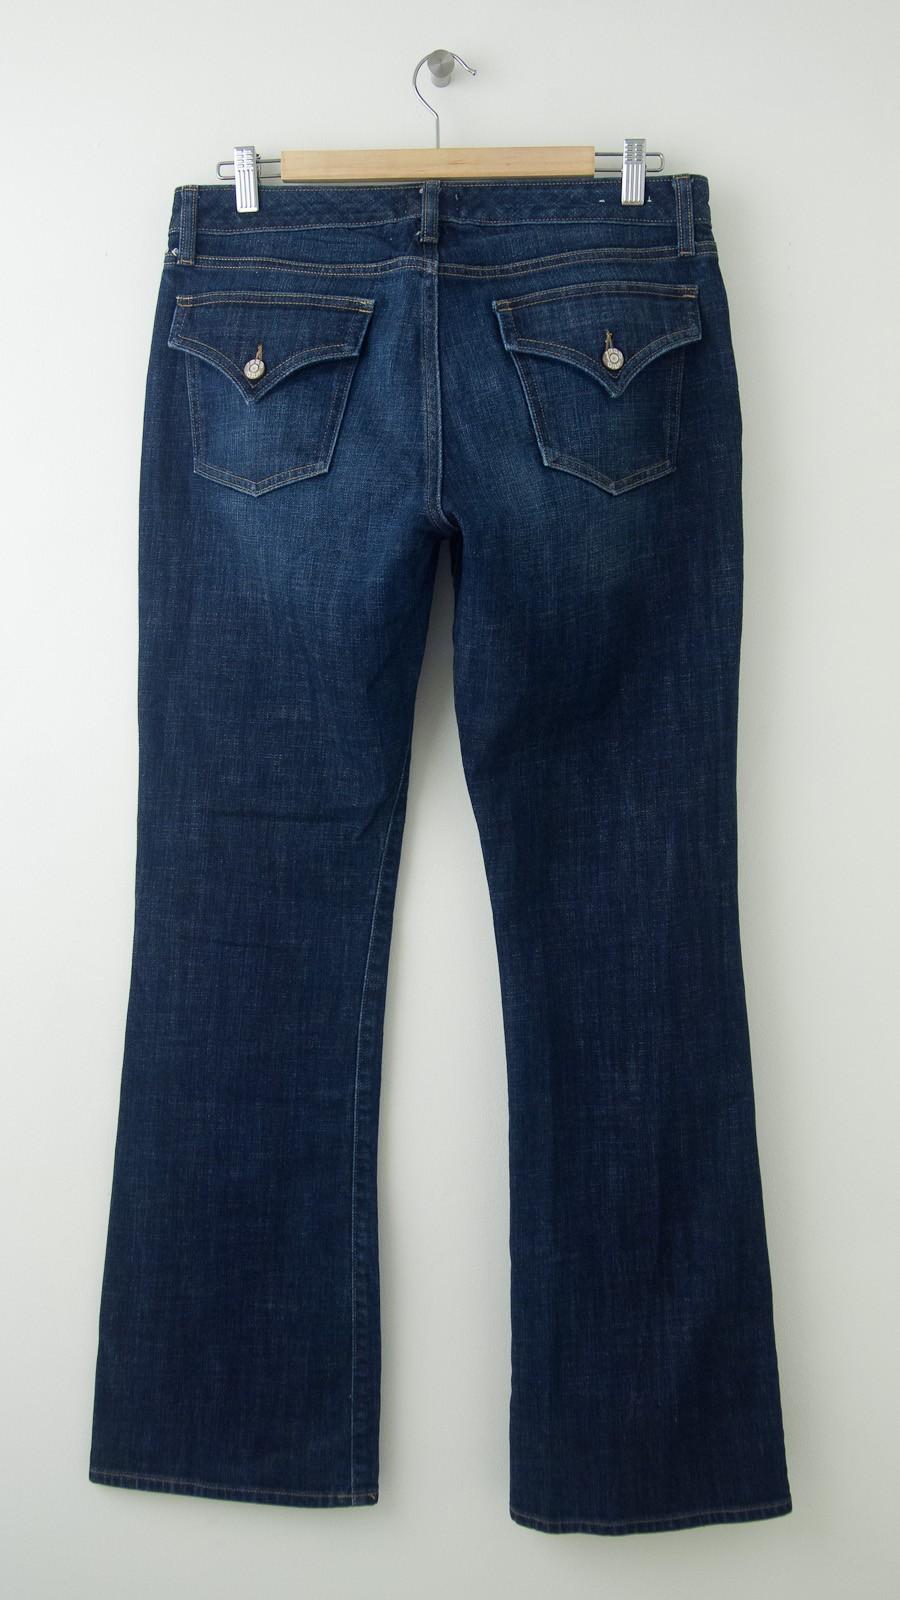 Gap Curvy Flare Jeans Women S 10 30r Regular